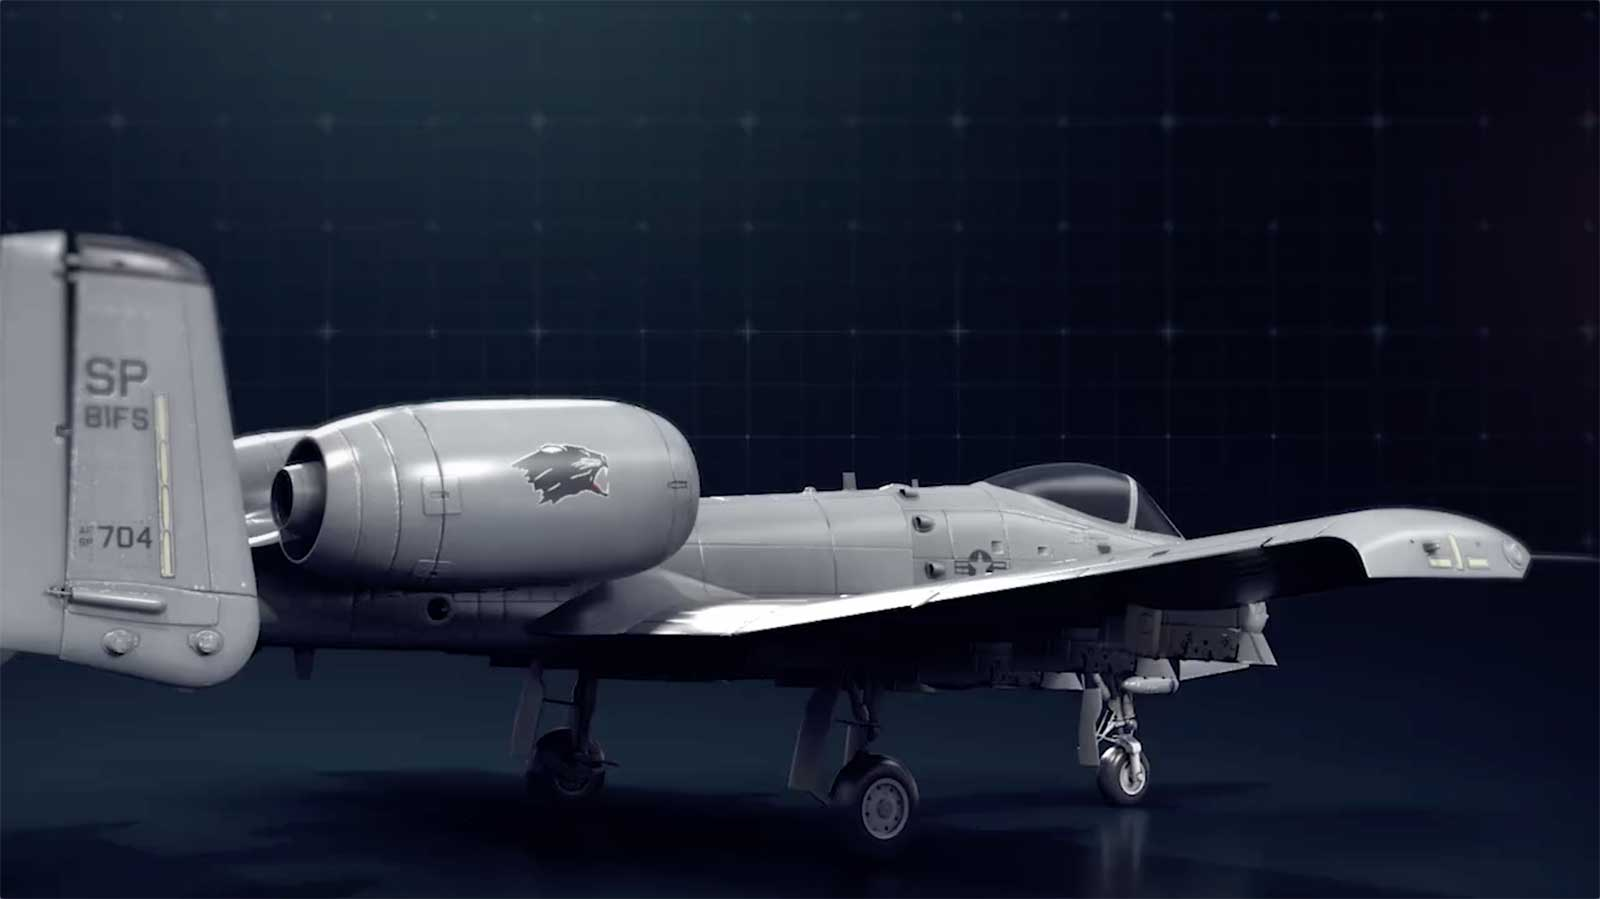 U.S. Air Force Aviation Training